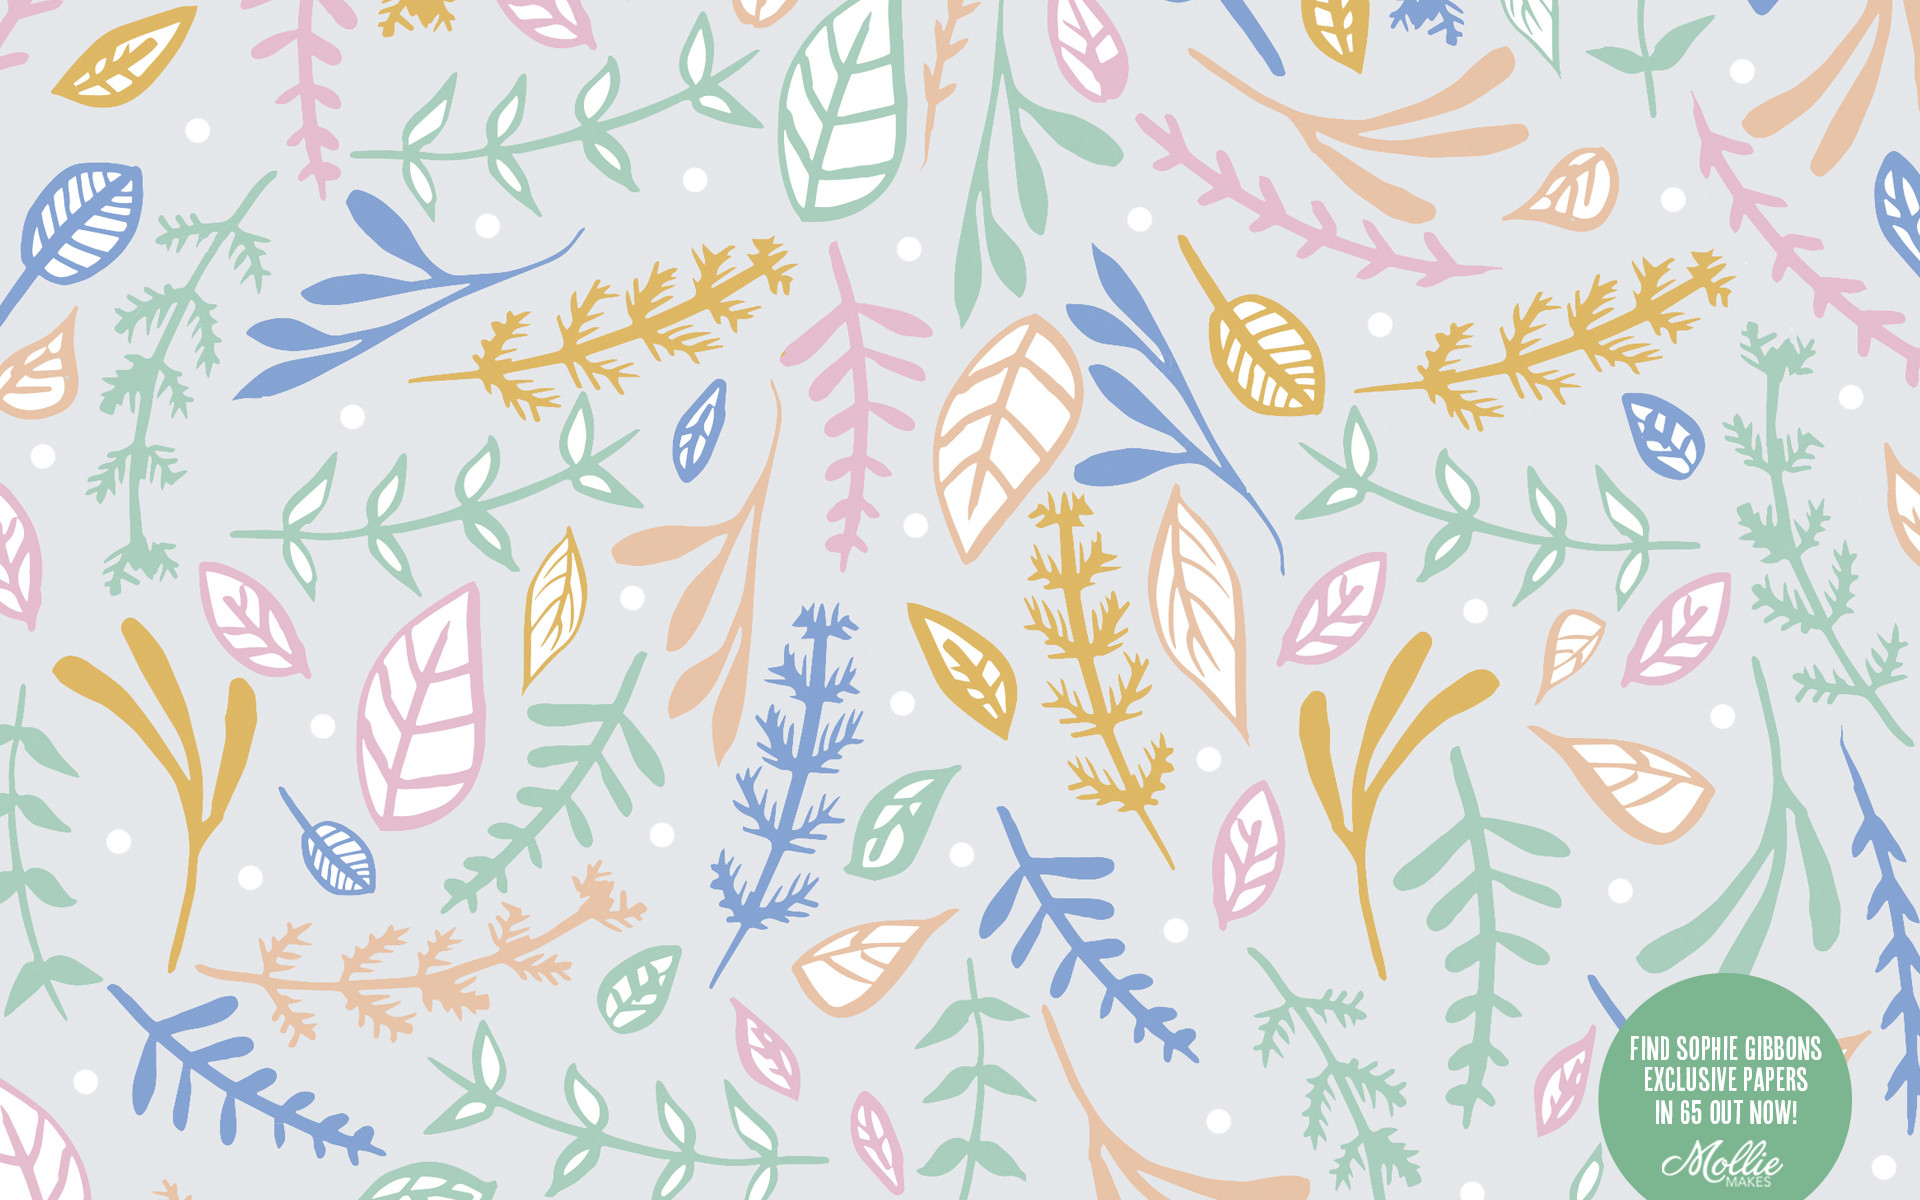 Free mobile wallpapers | Sophie Gibbons for Mollie Makes | Free desktop  wallpaper